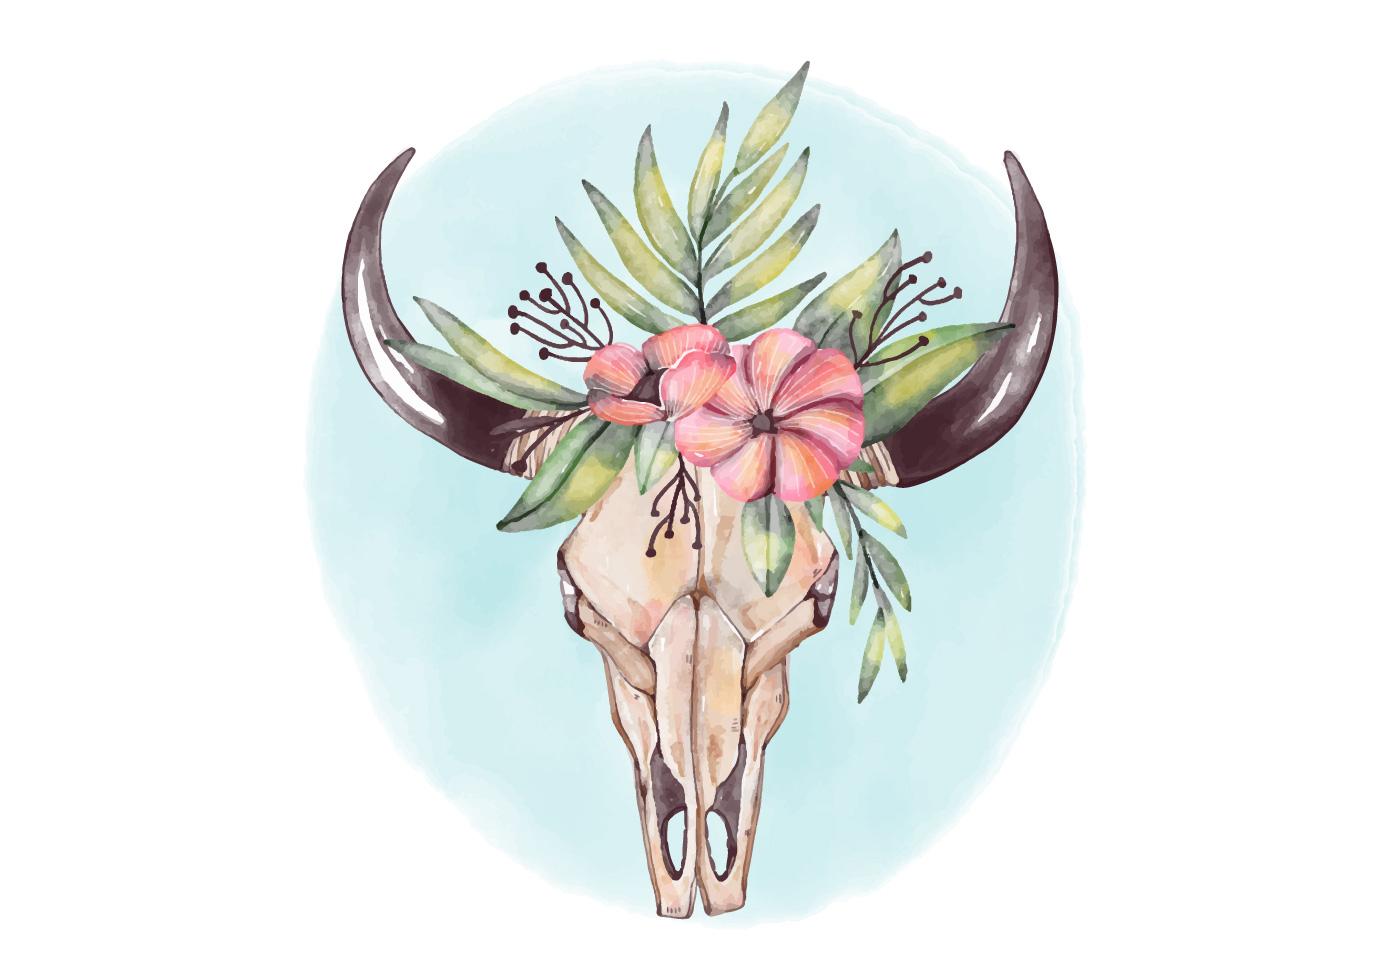 bull rider free vector art  125 free downloads bull riding clip art black and white rodeo bull riding clip art